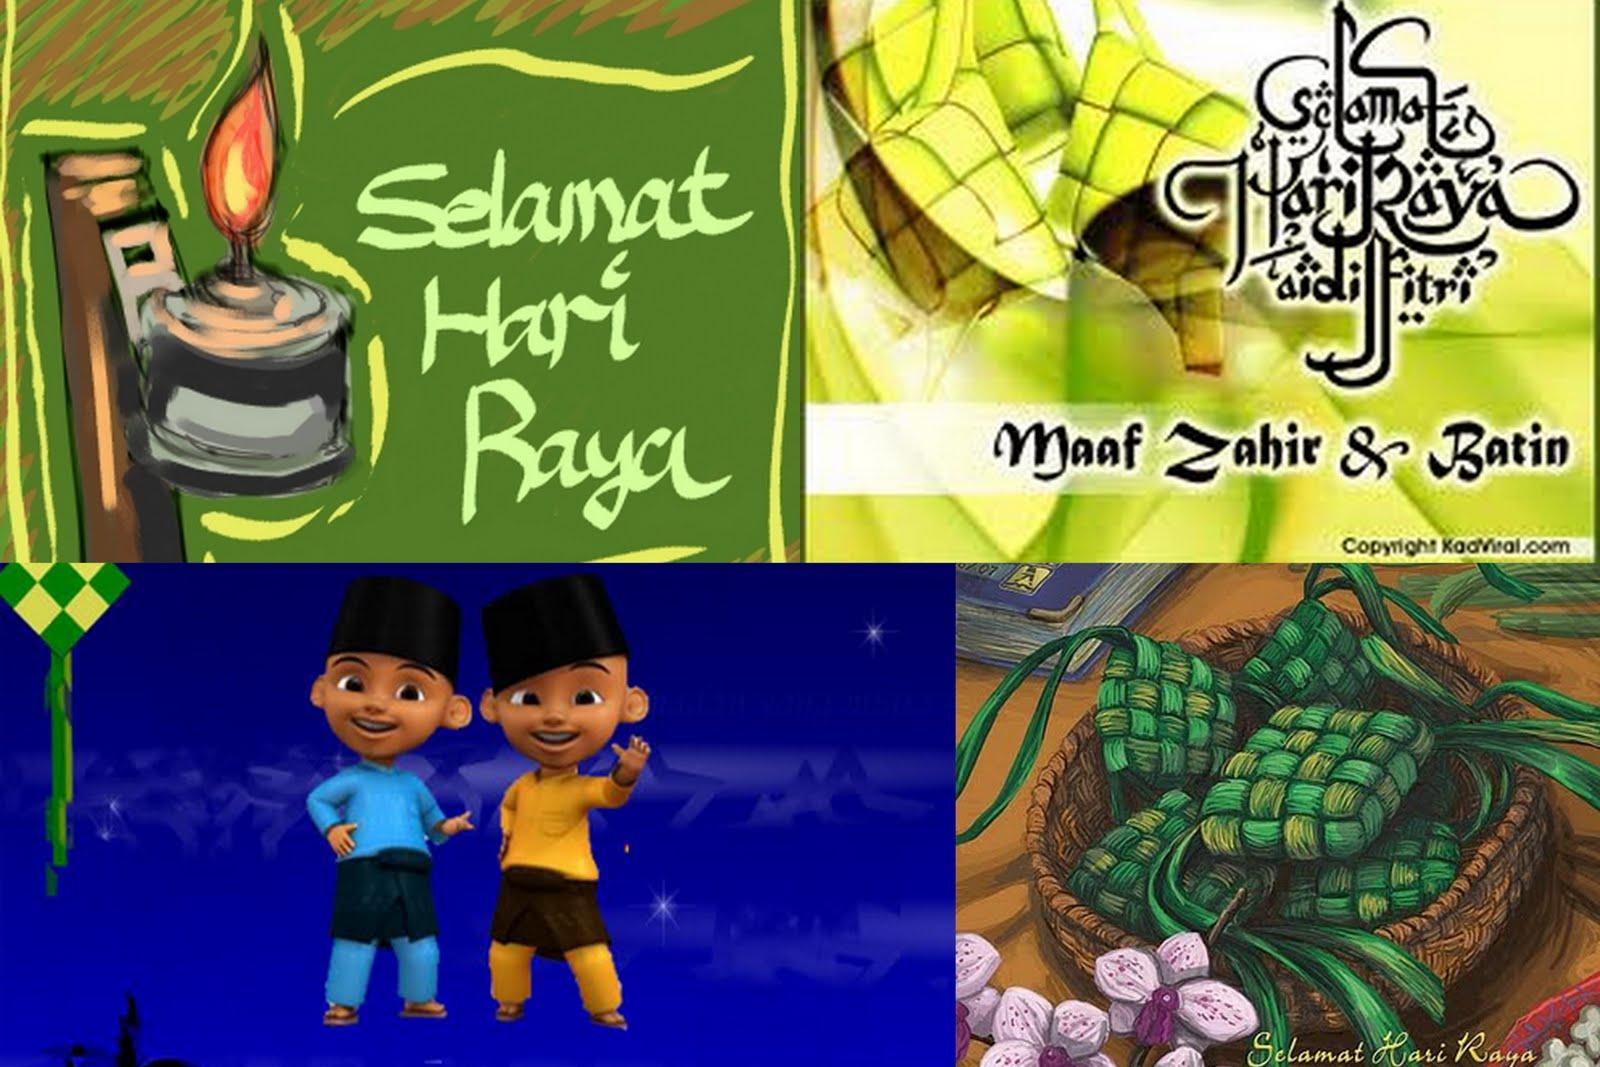 Small Animals77 Selamat Hari Raya Aidil Fitri Maaf Zahir